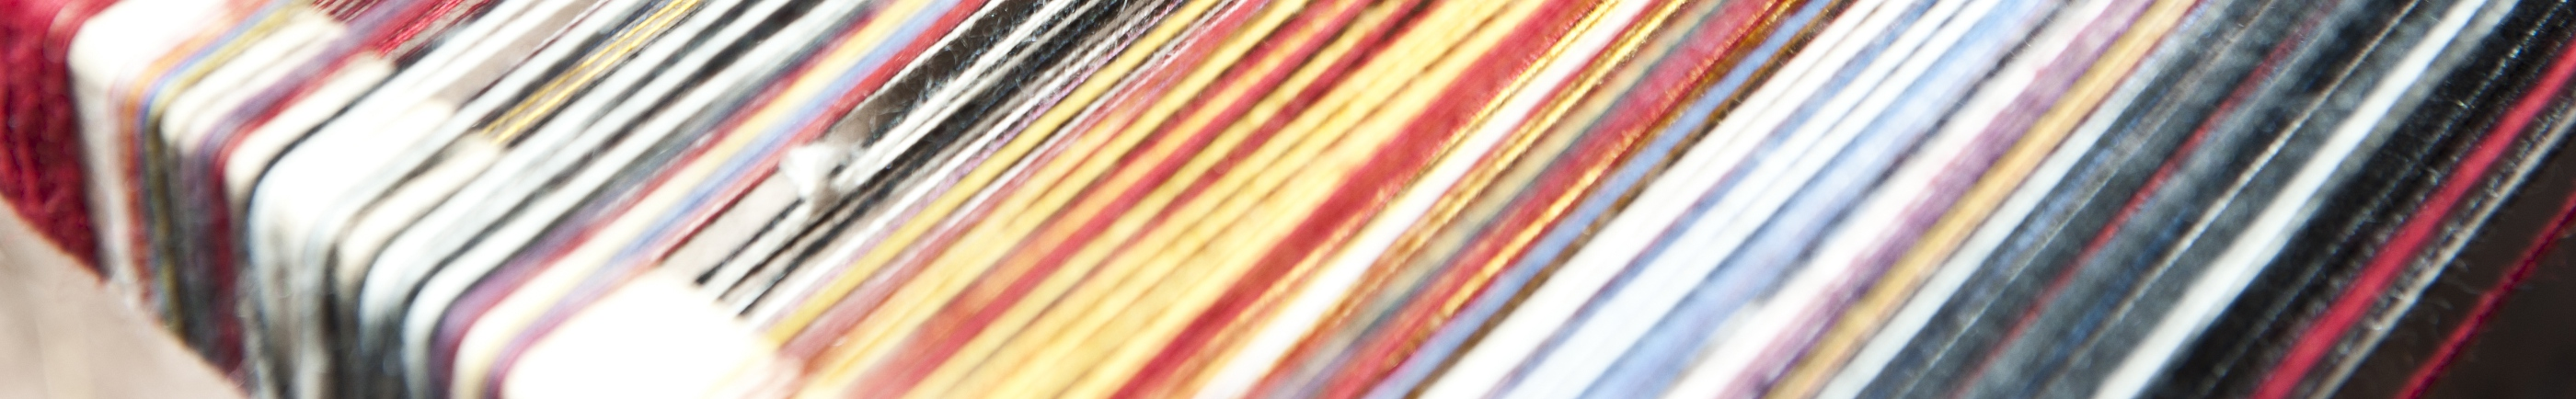 coloured files